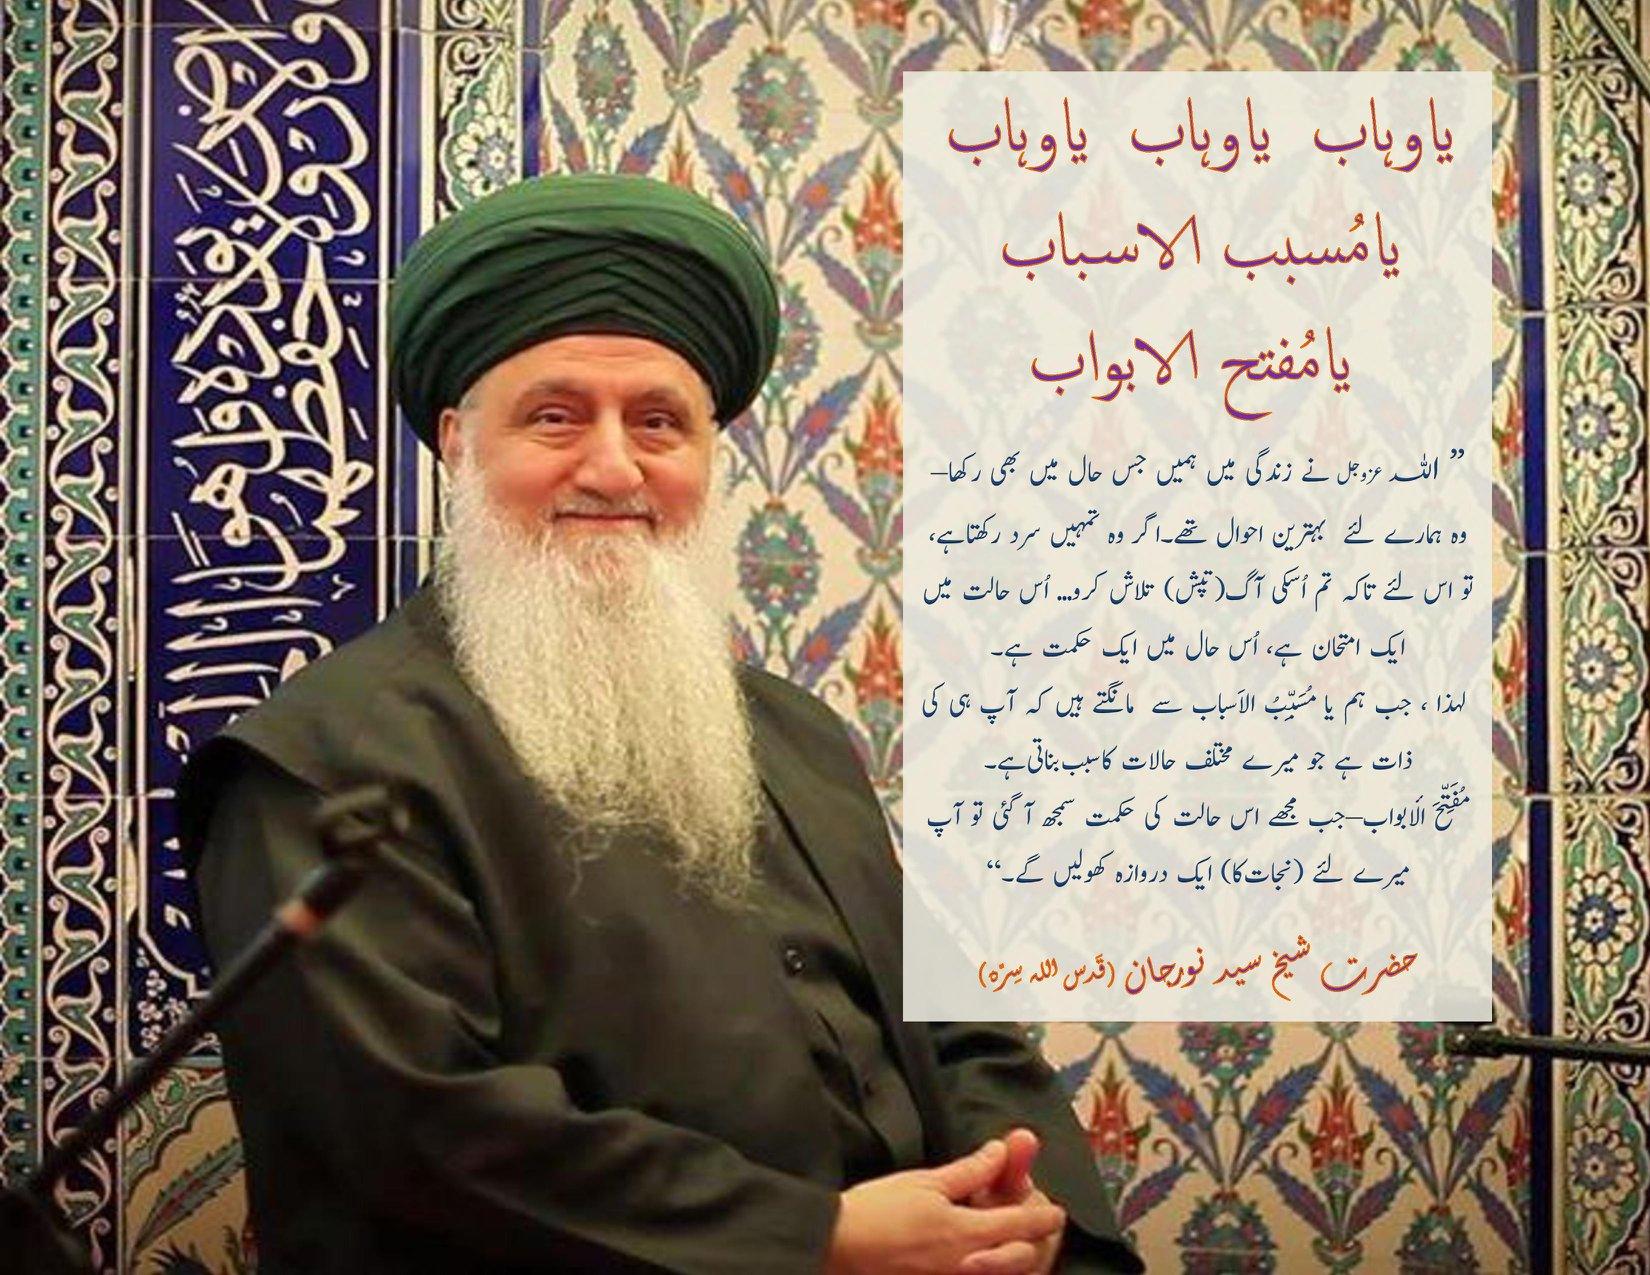 The One who causes every condition  – Ya Musabbibal Asbab   مُسَبِّبَ الاَسْبَاب...